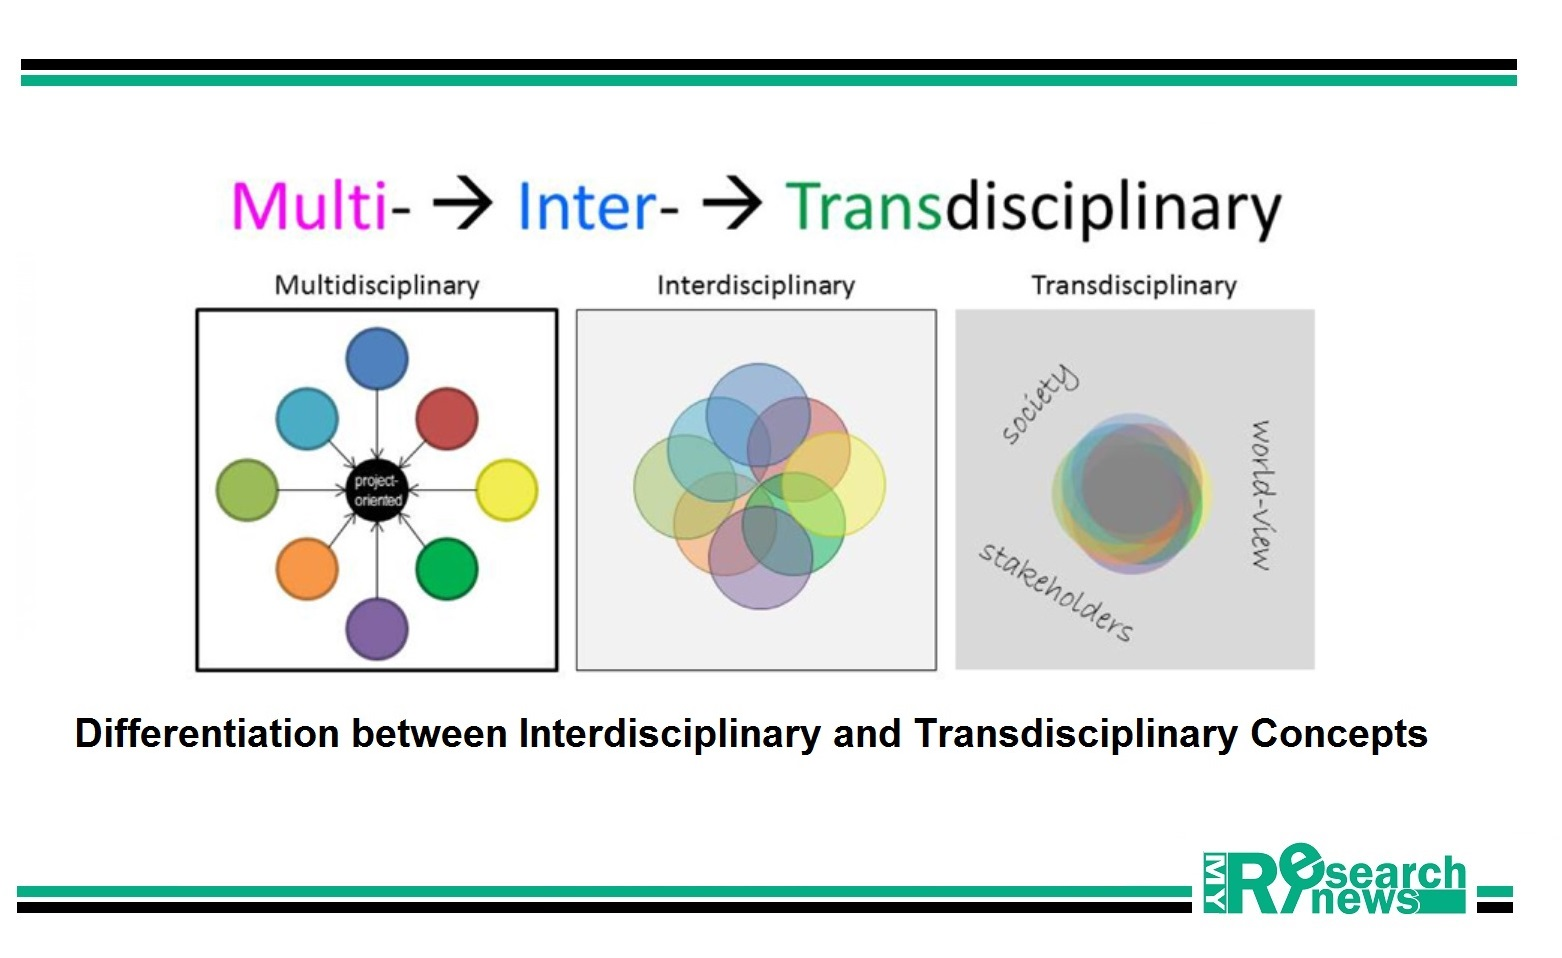 Multidisciplinary teams